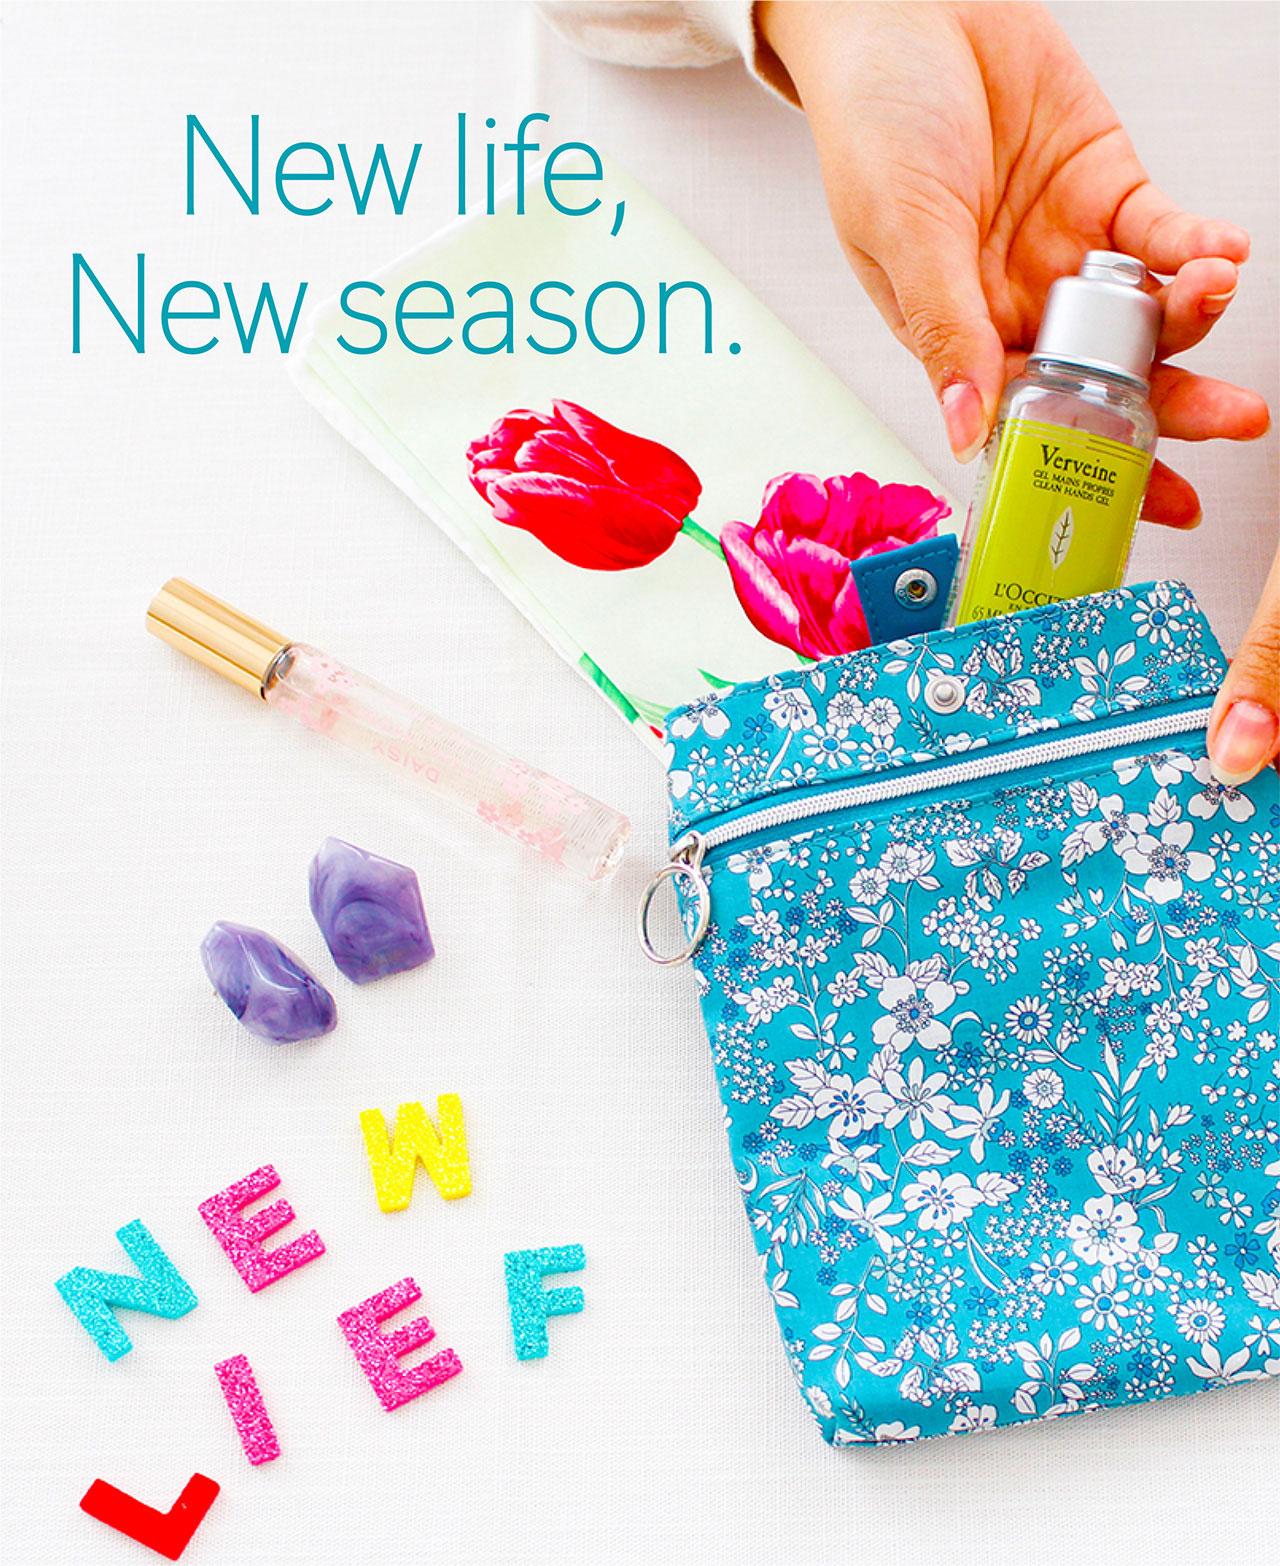 New life,New season.